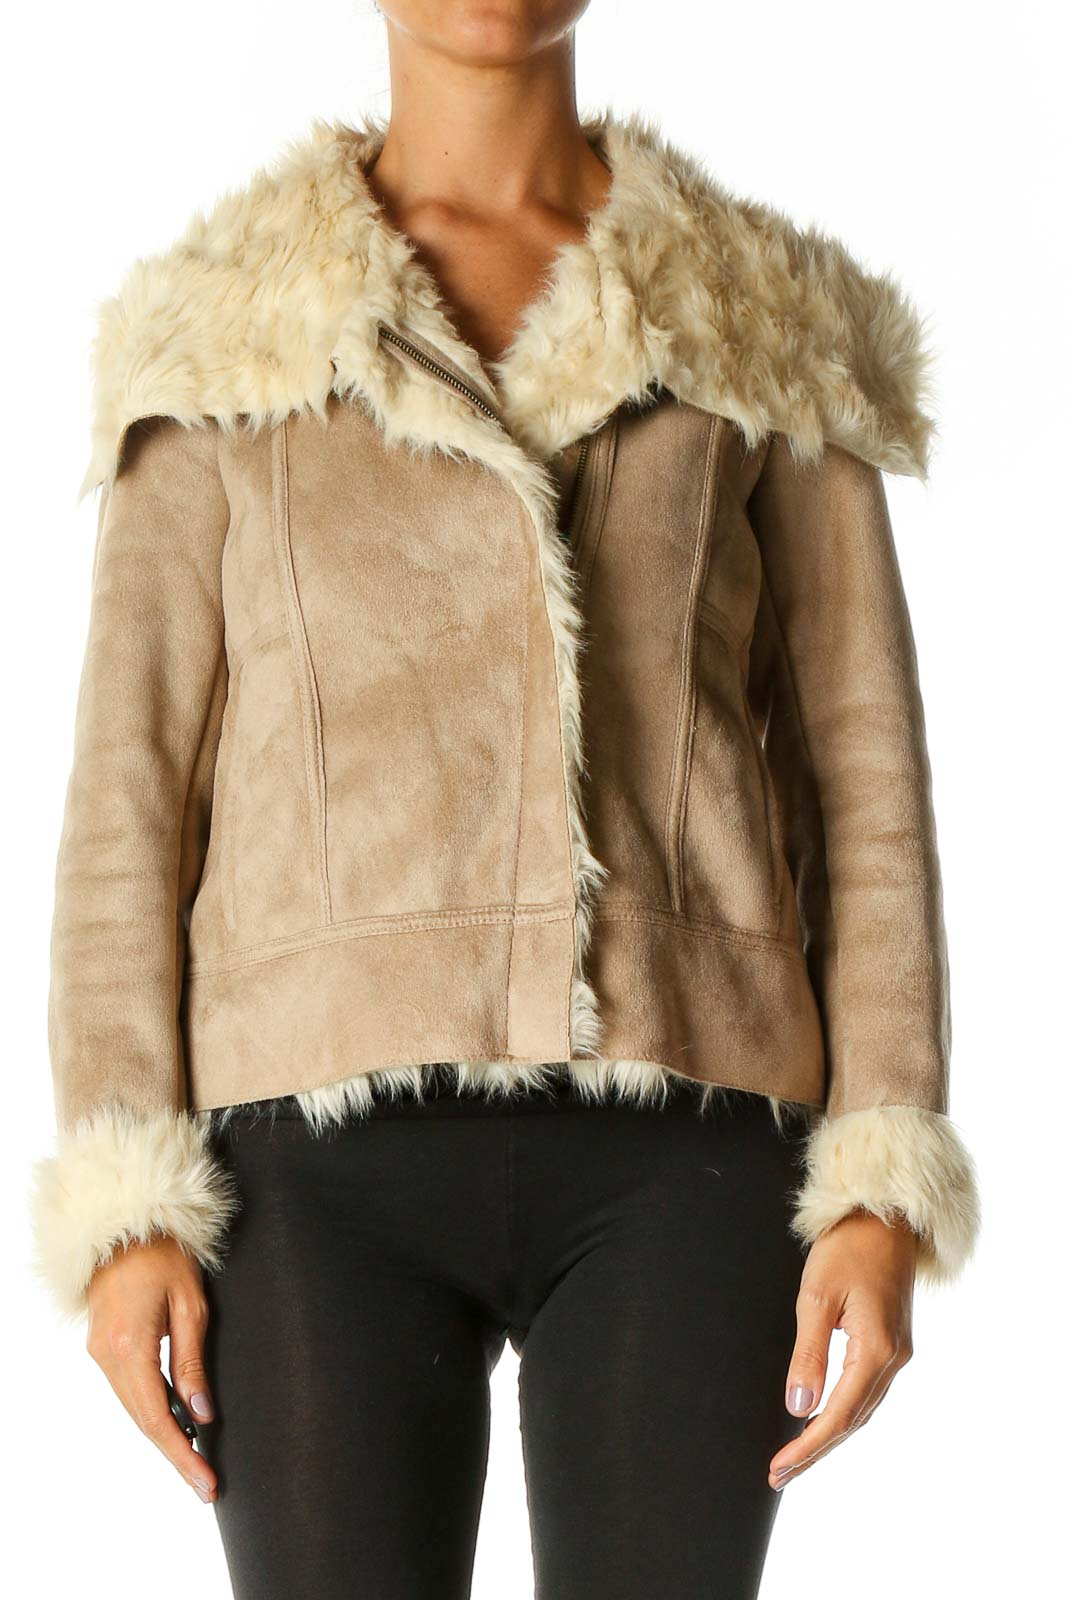 Beige Shearling Jacket Front